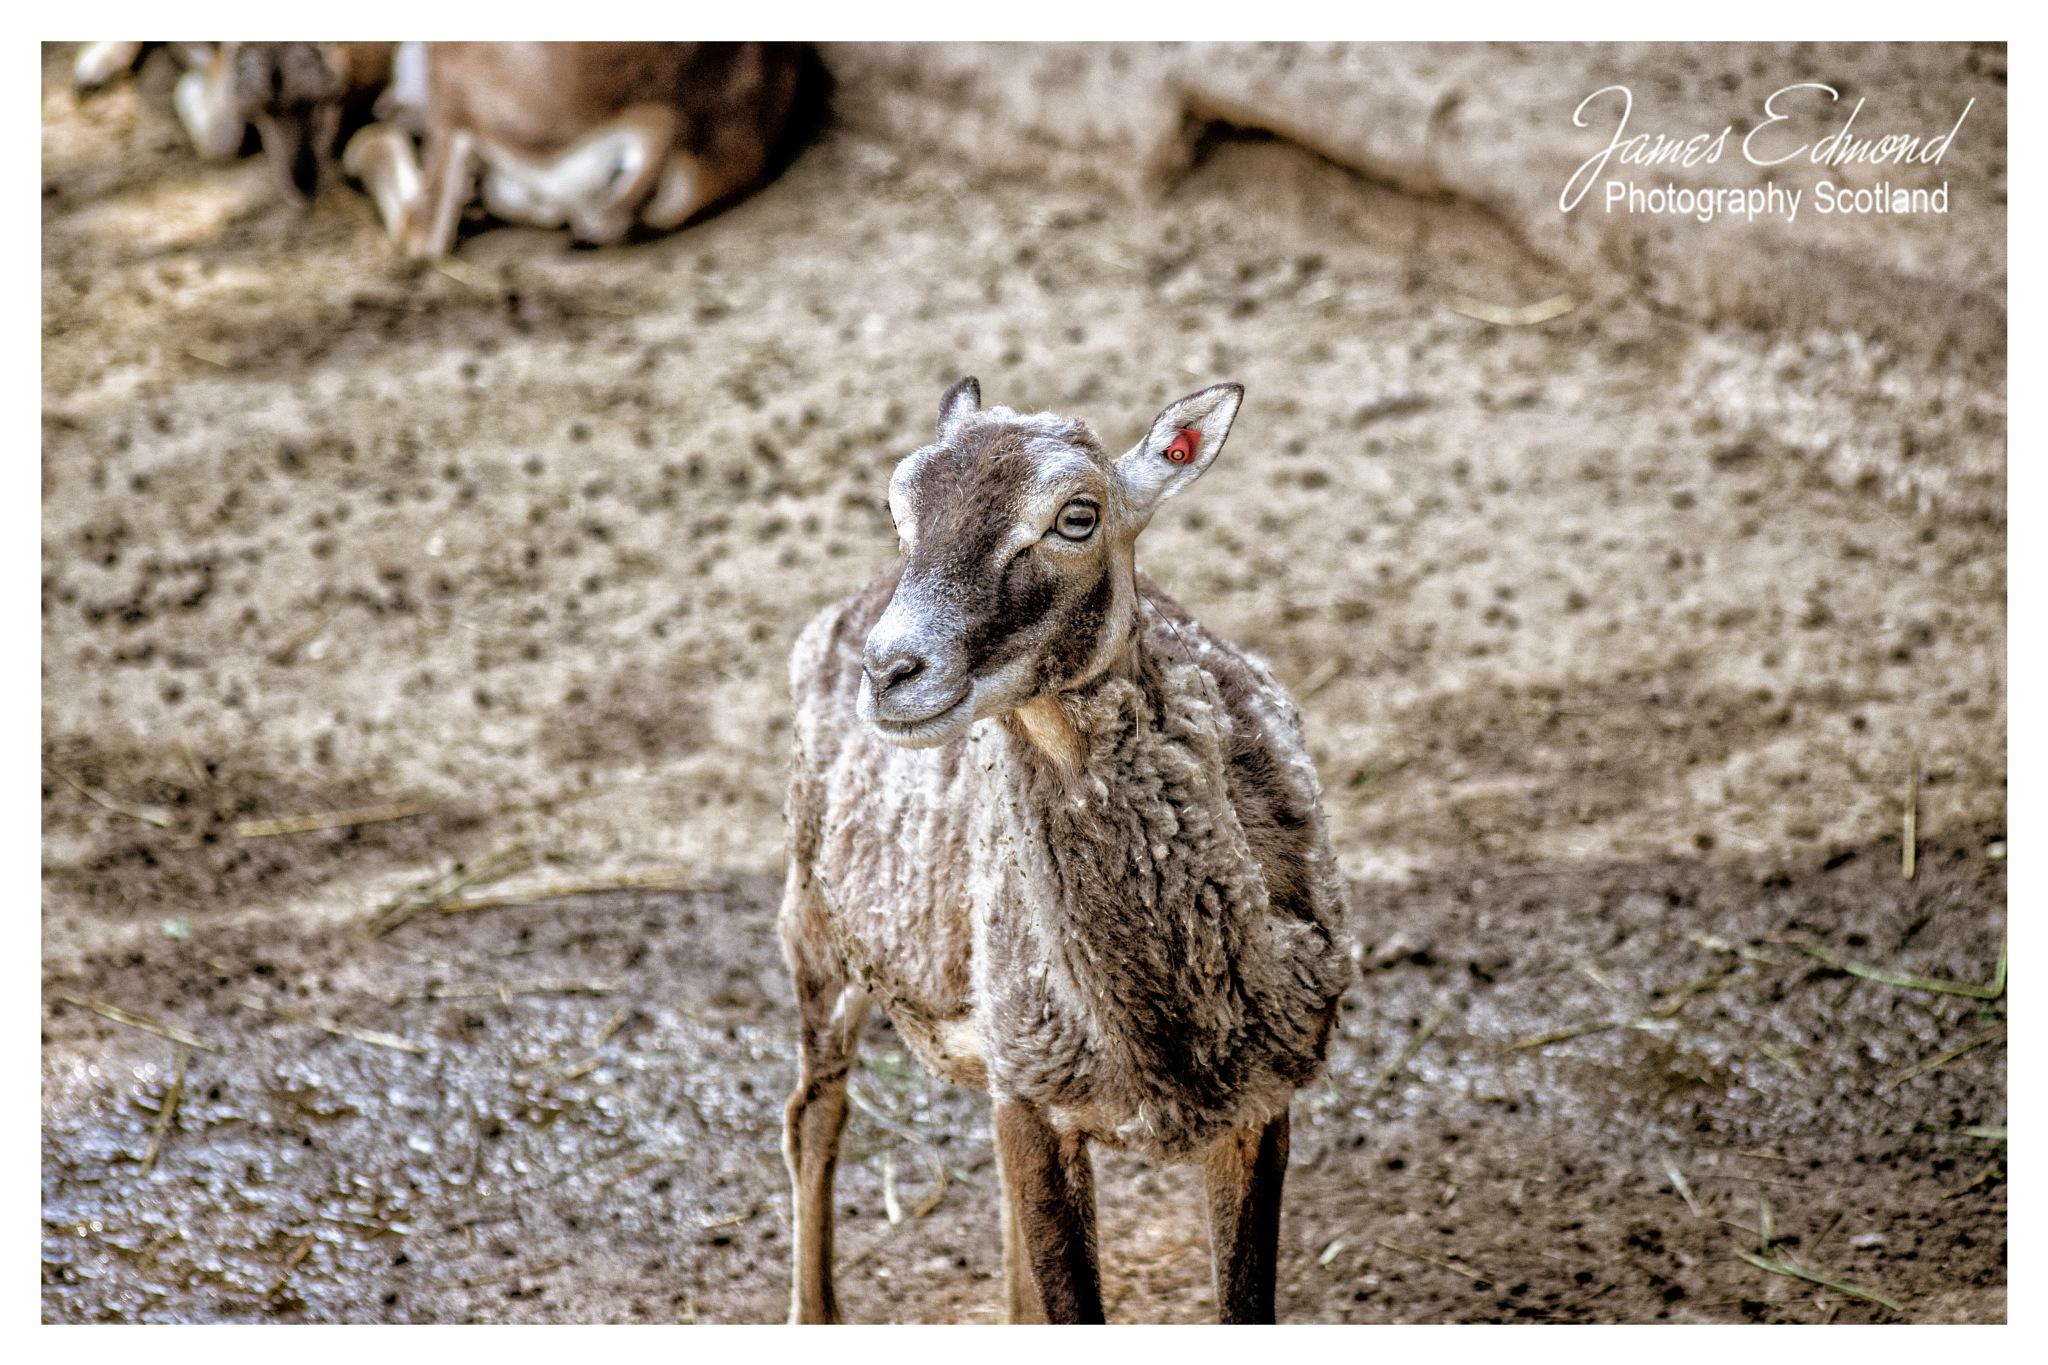 Barbary Sheep by James Edmond Photography